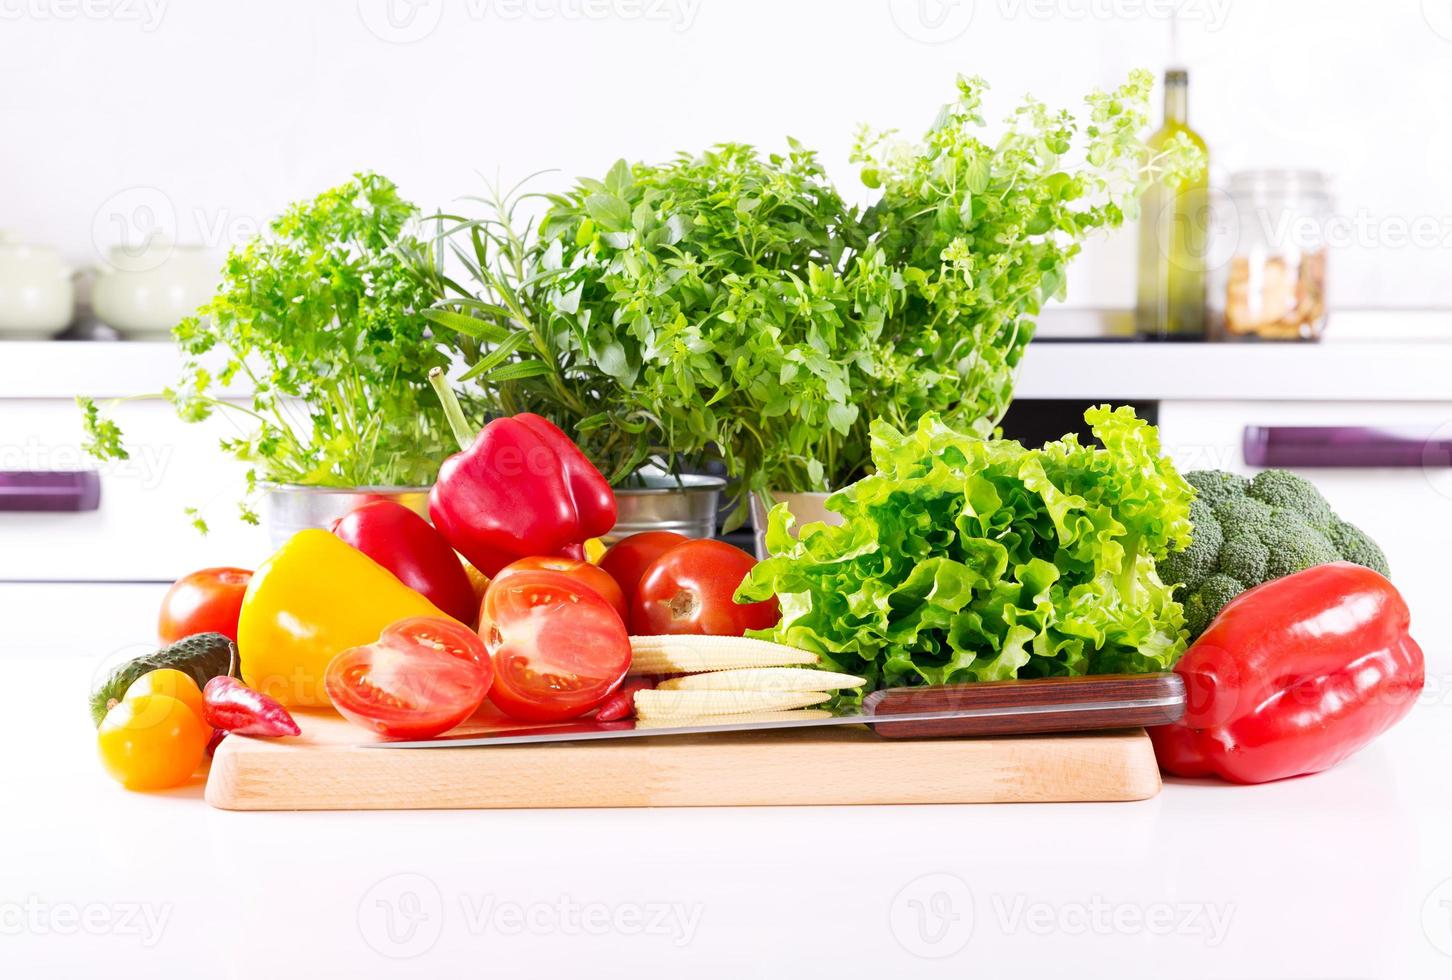 verse groenten in de keuken foto